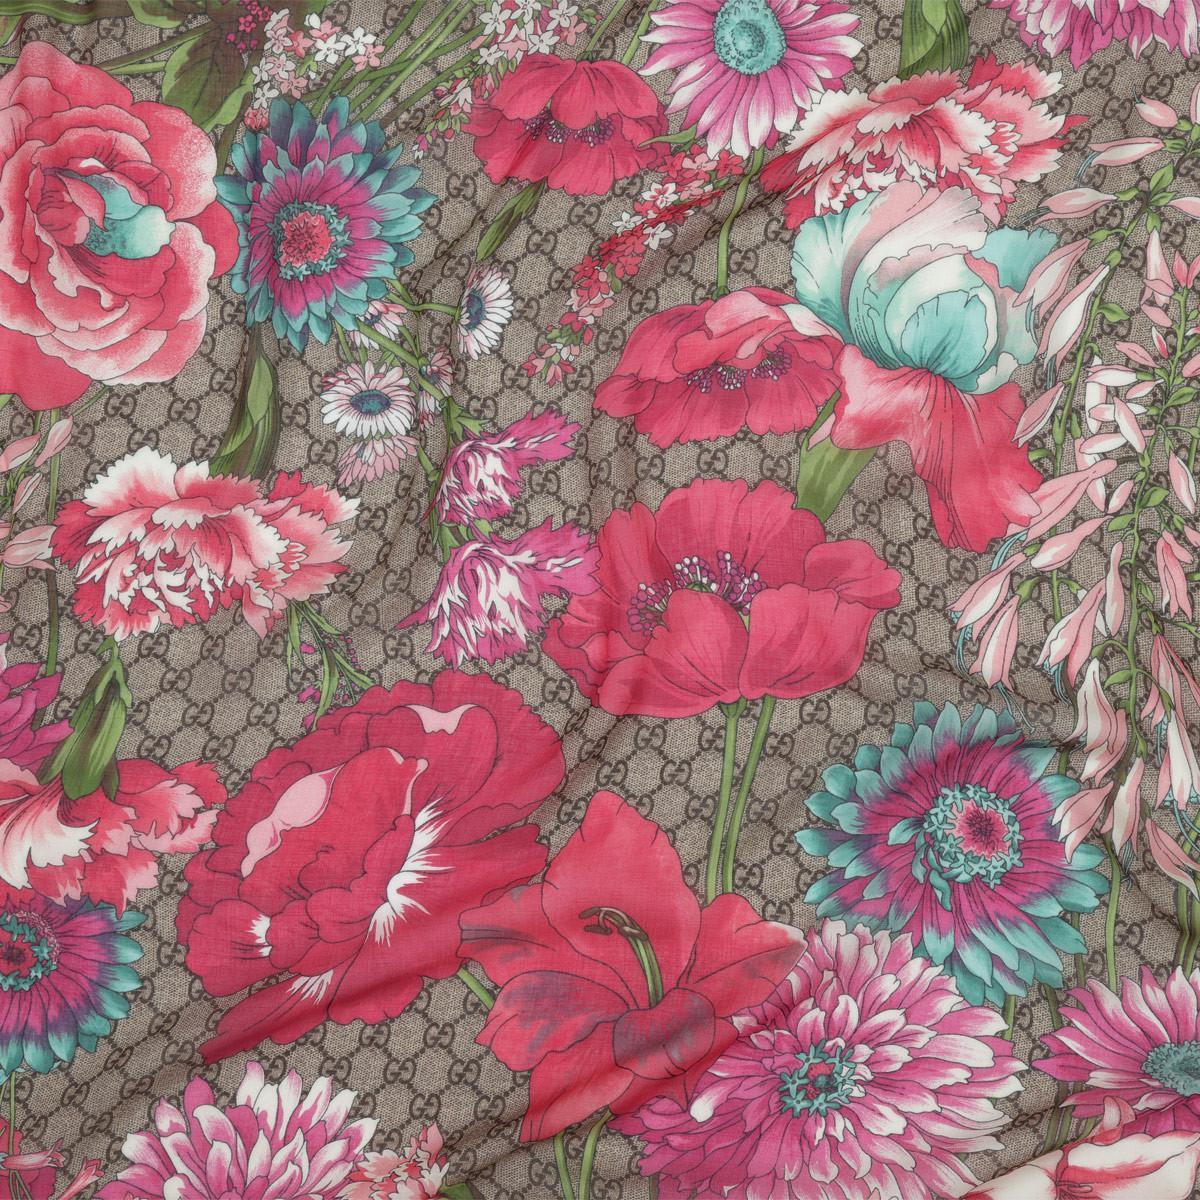 97c95e5ab21 Gucci - Multicolor Flowerprint Silk Scarf Marrone fuchsia - Lyst. View  fullscreen